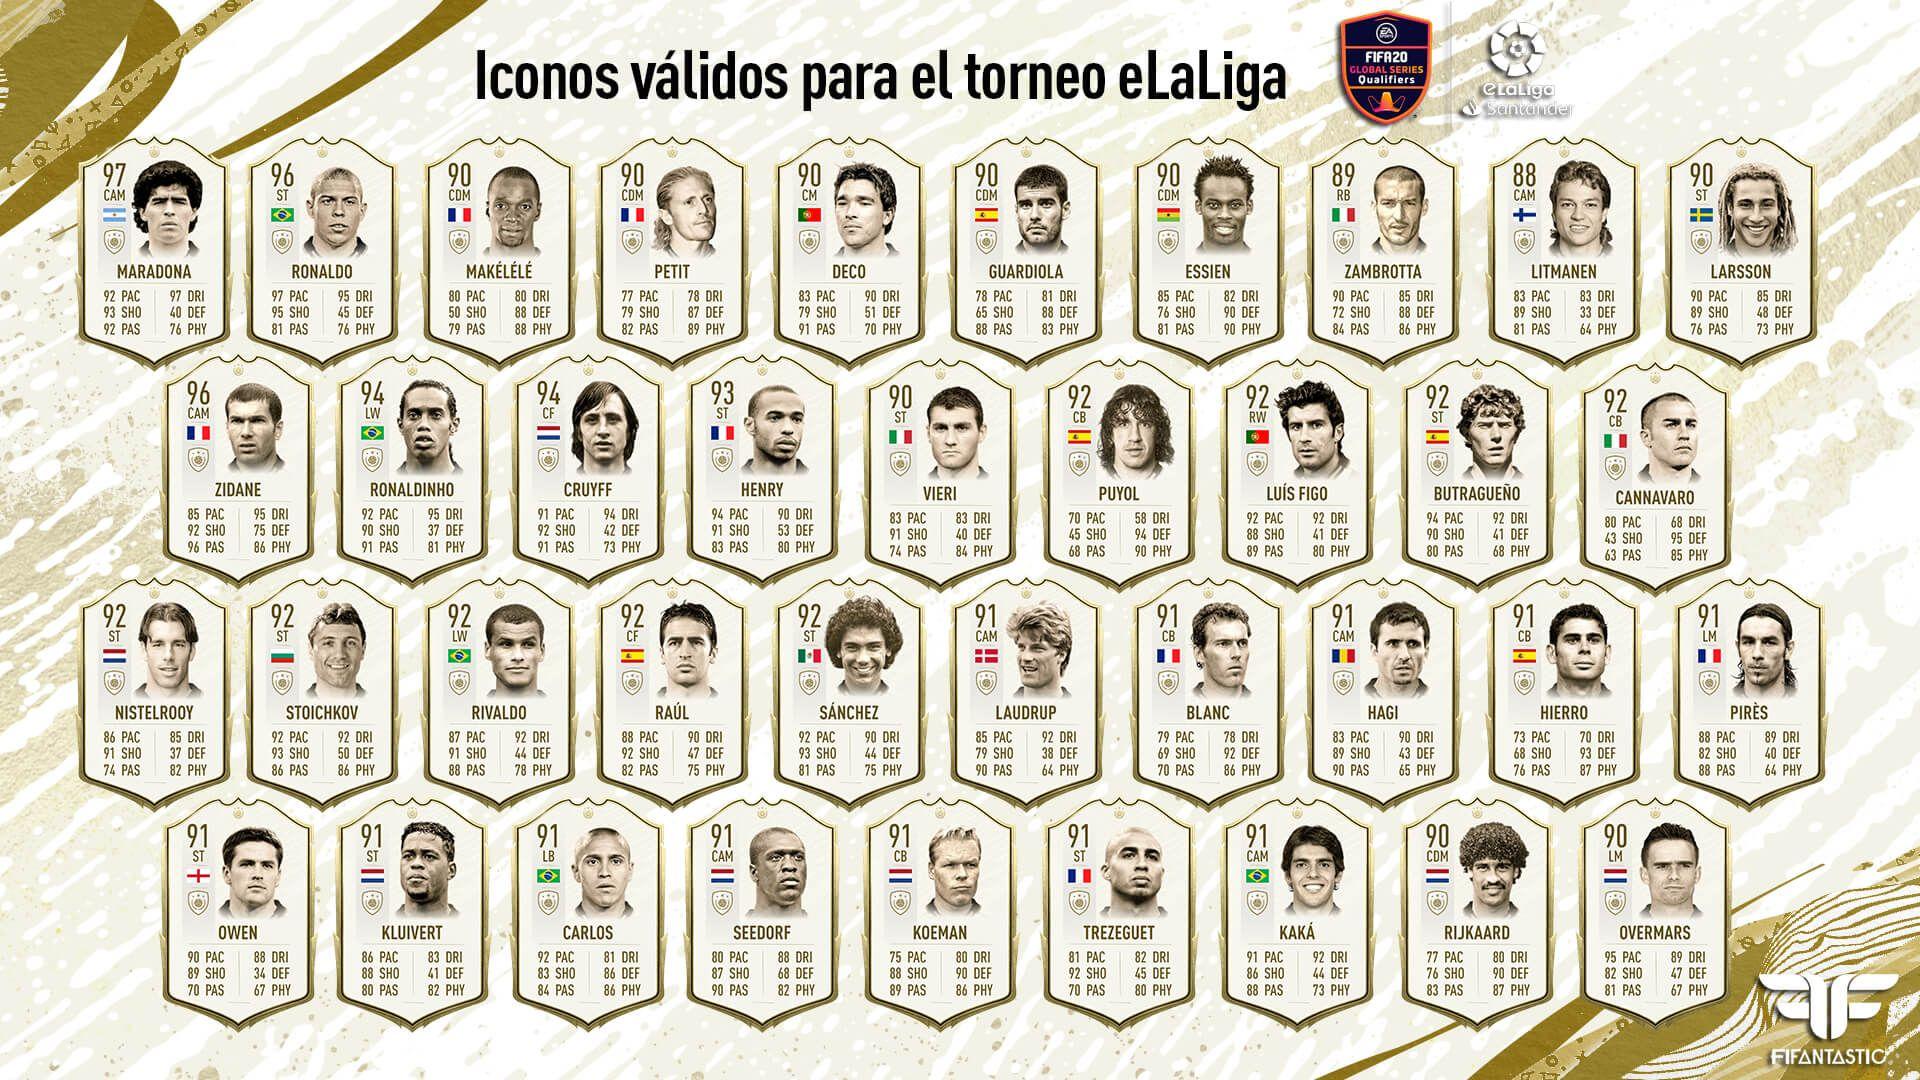 Iconos torneo eLaLiga FIFA 20